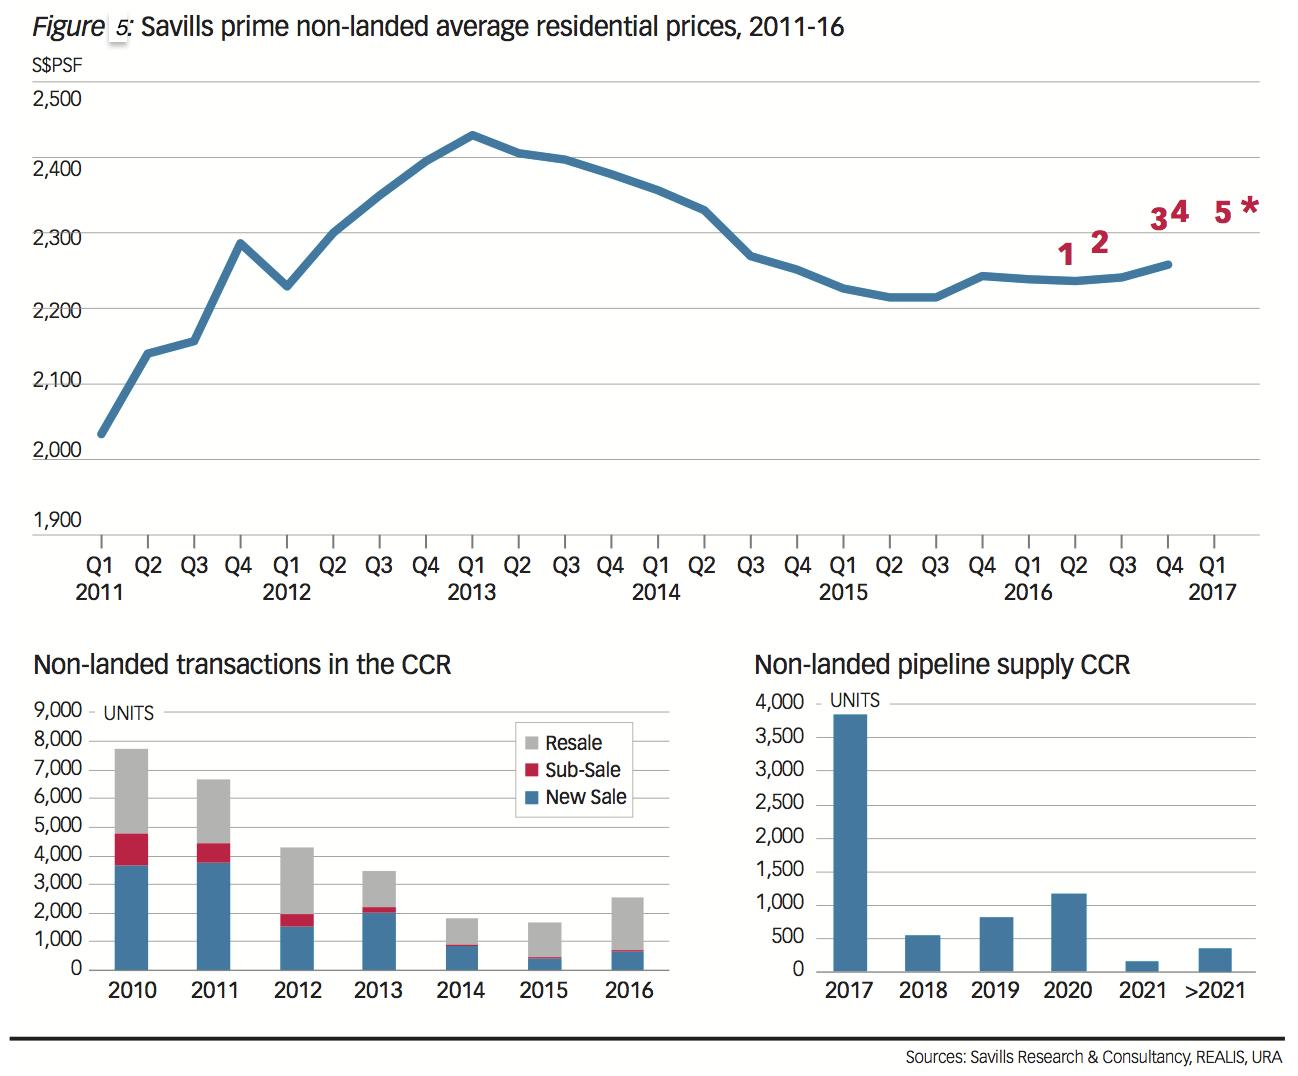 Savills Singapore prime residential property market price trend transaction and land supply